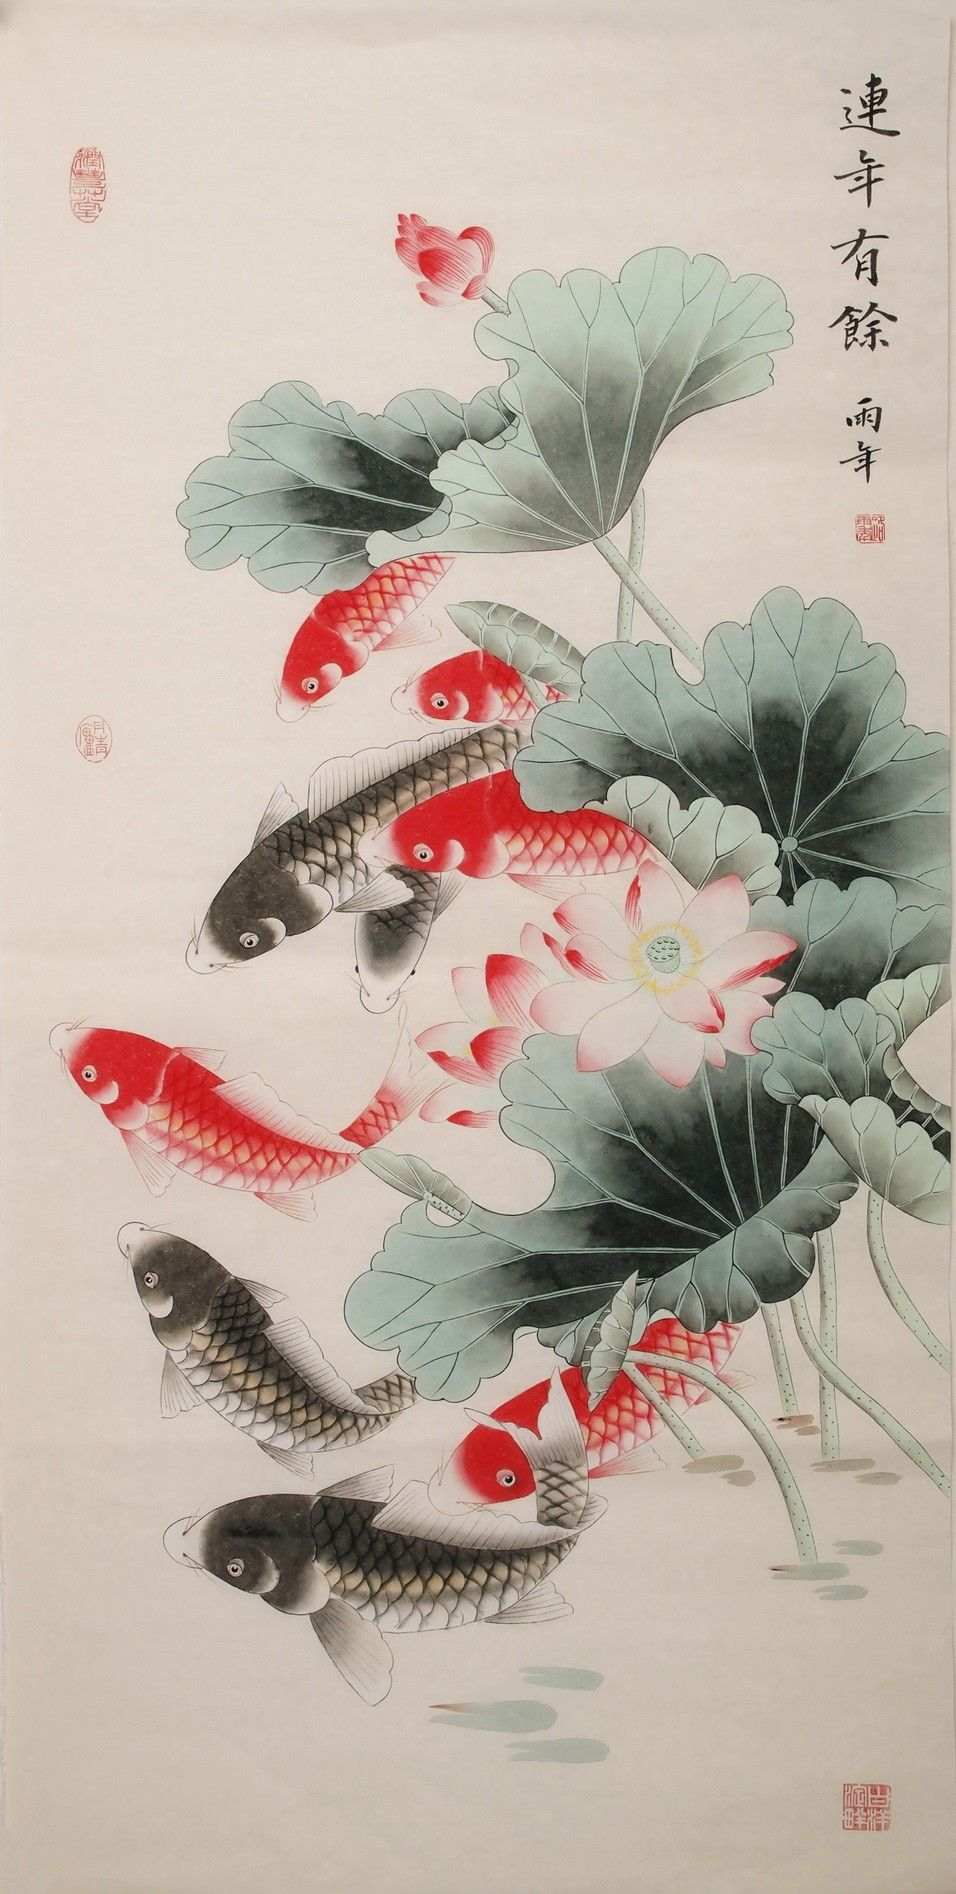 Fish Cnag000516 Japanese Drawings Japanese Art Fish Art